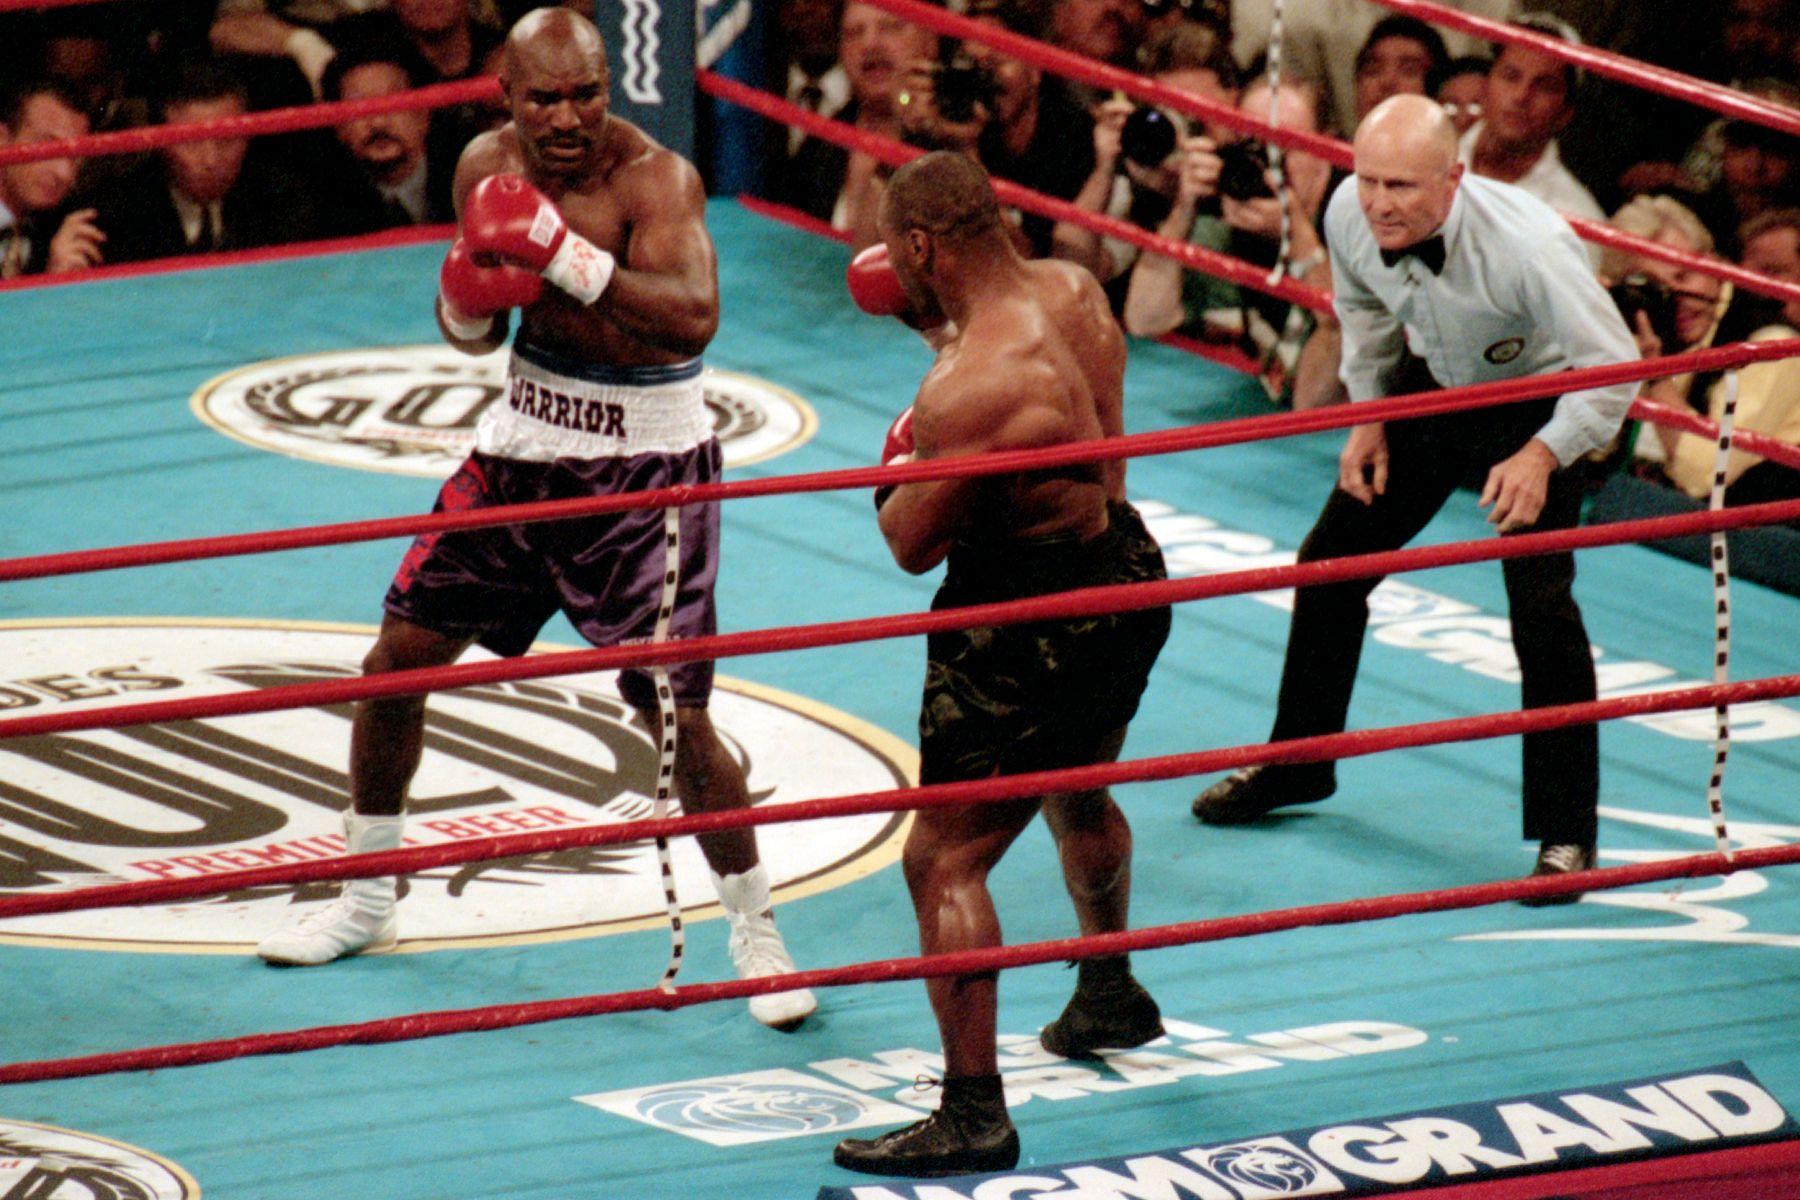 Mike Tyson vs. Evander Holyfield II, LAS VEGAS